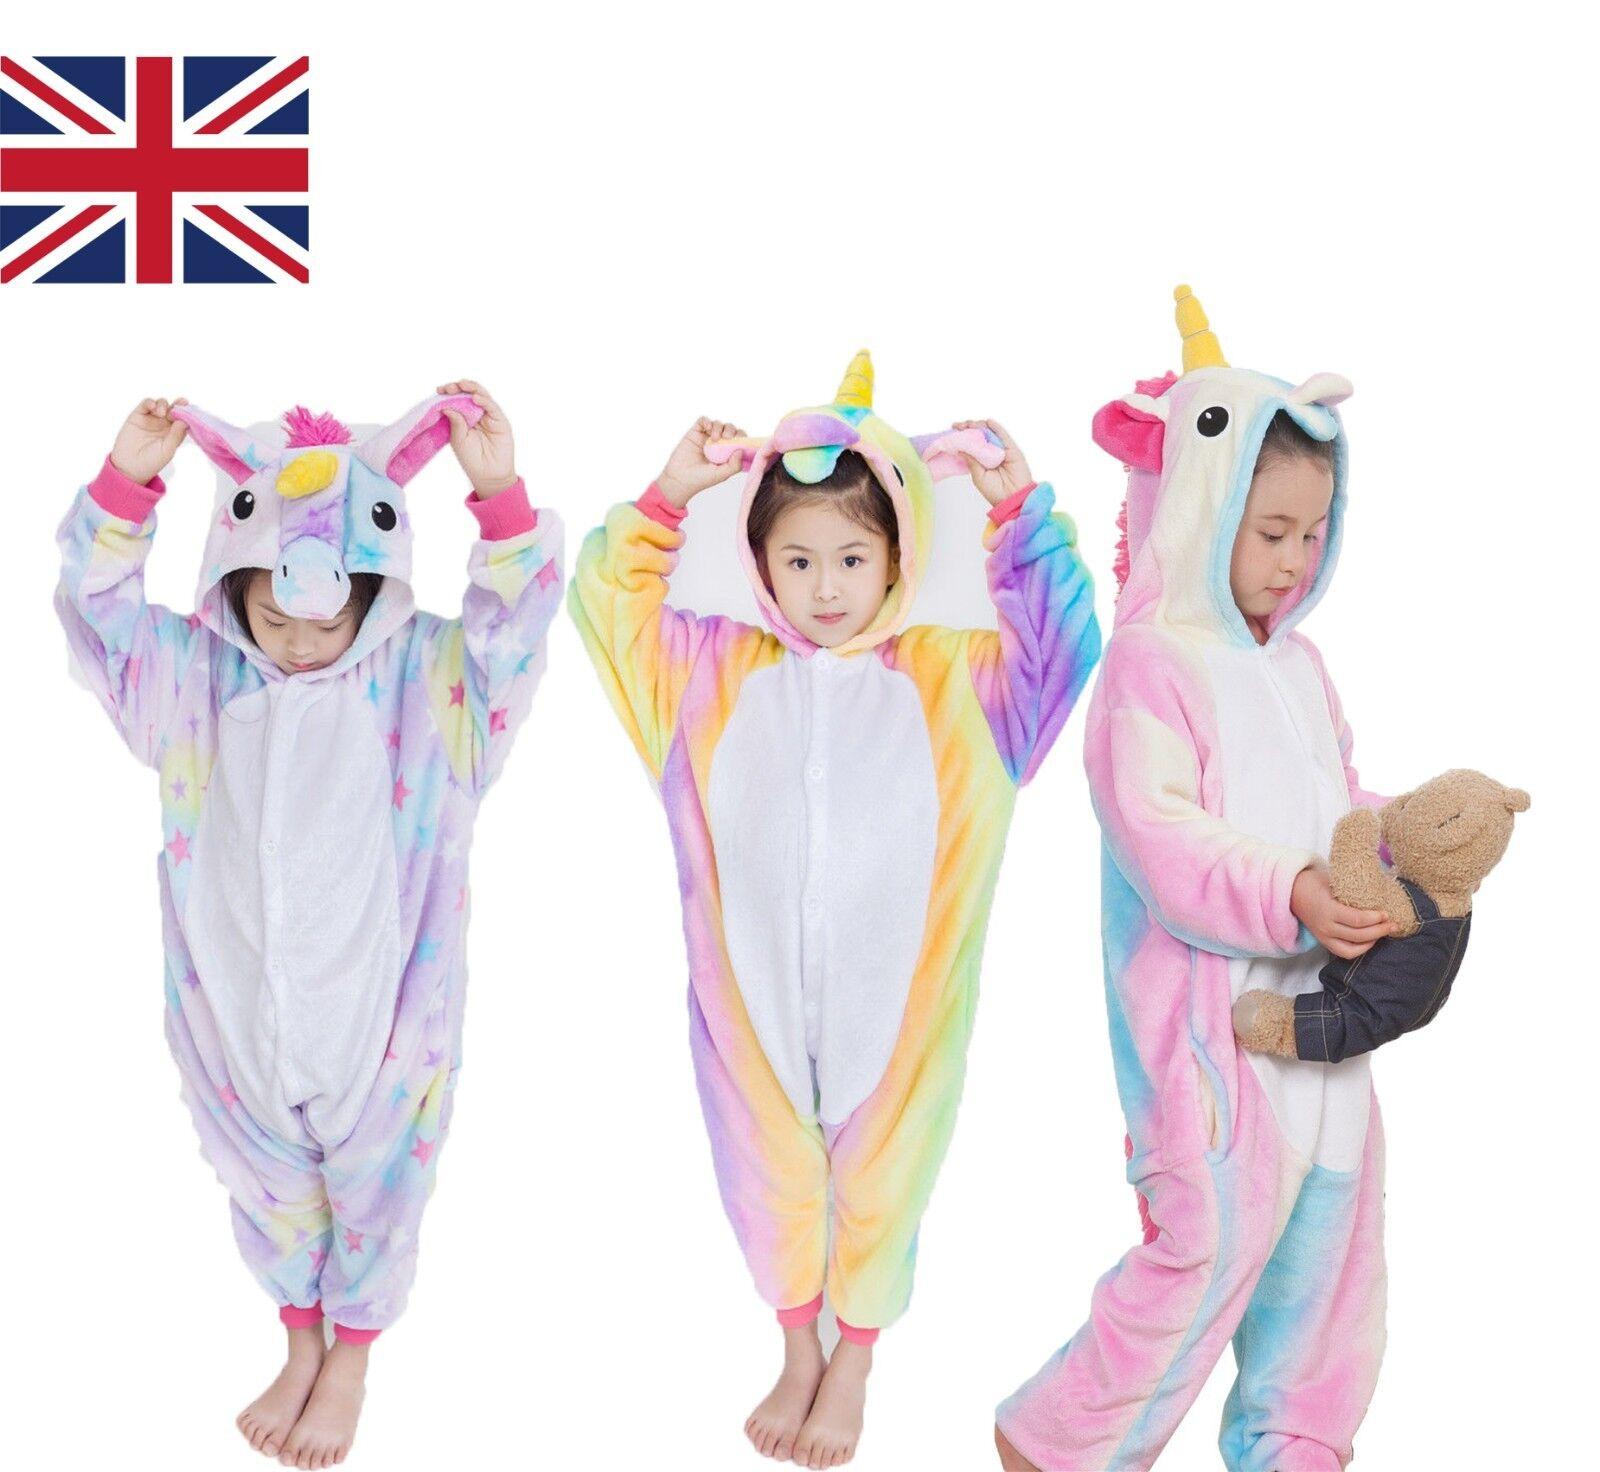 Bambini Arcobaleno Unicorn kigurumi ANIMALE COSPLAY COSTUME onesie11 pigiama